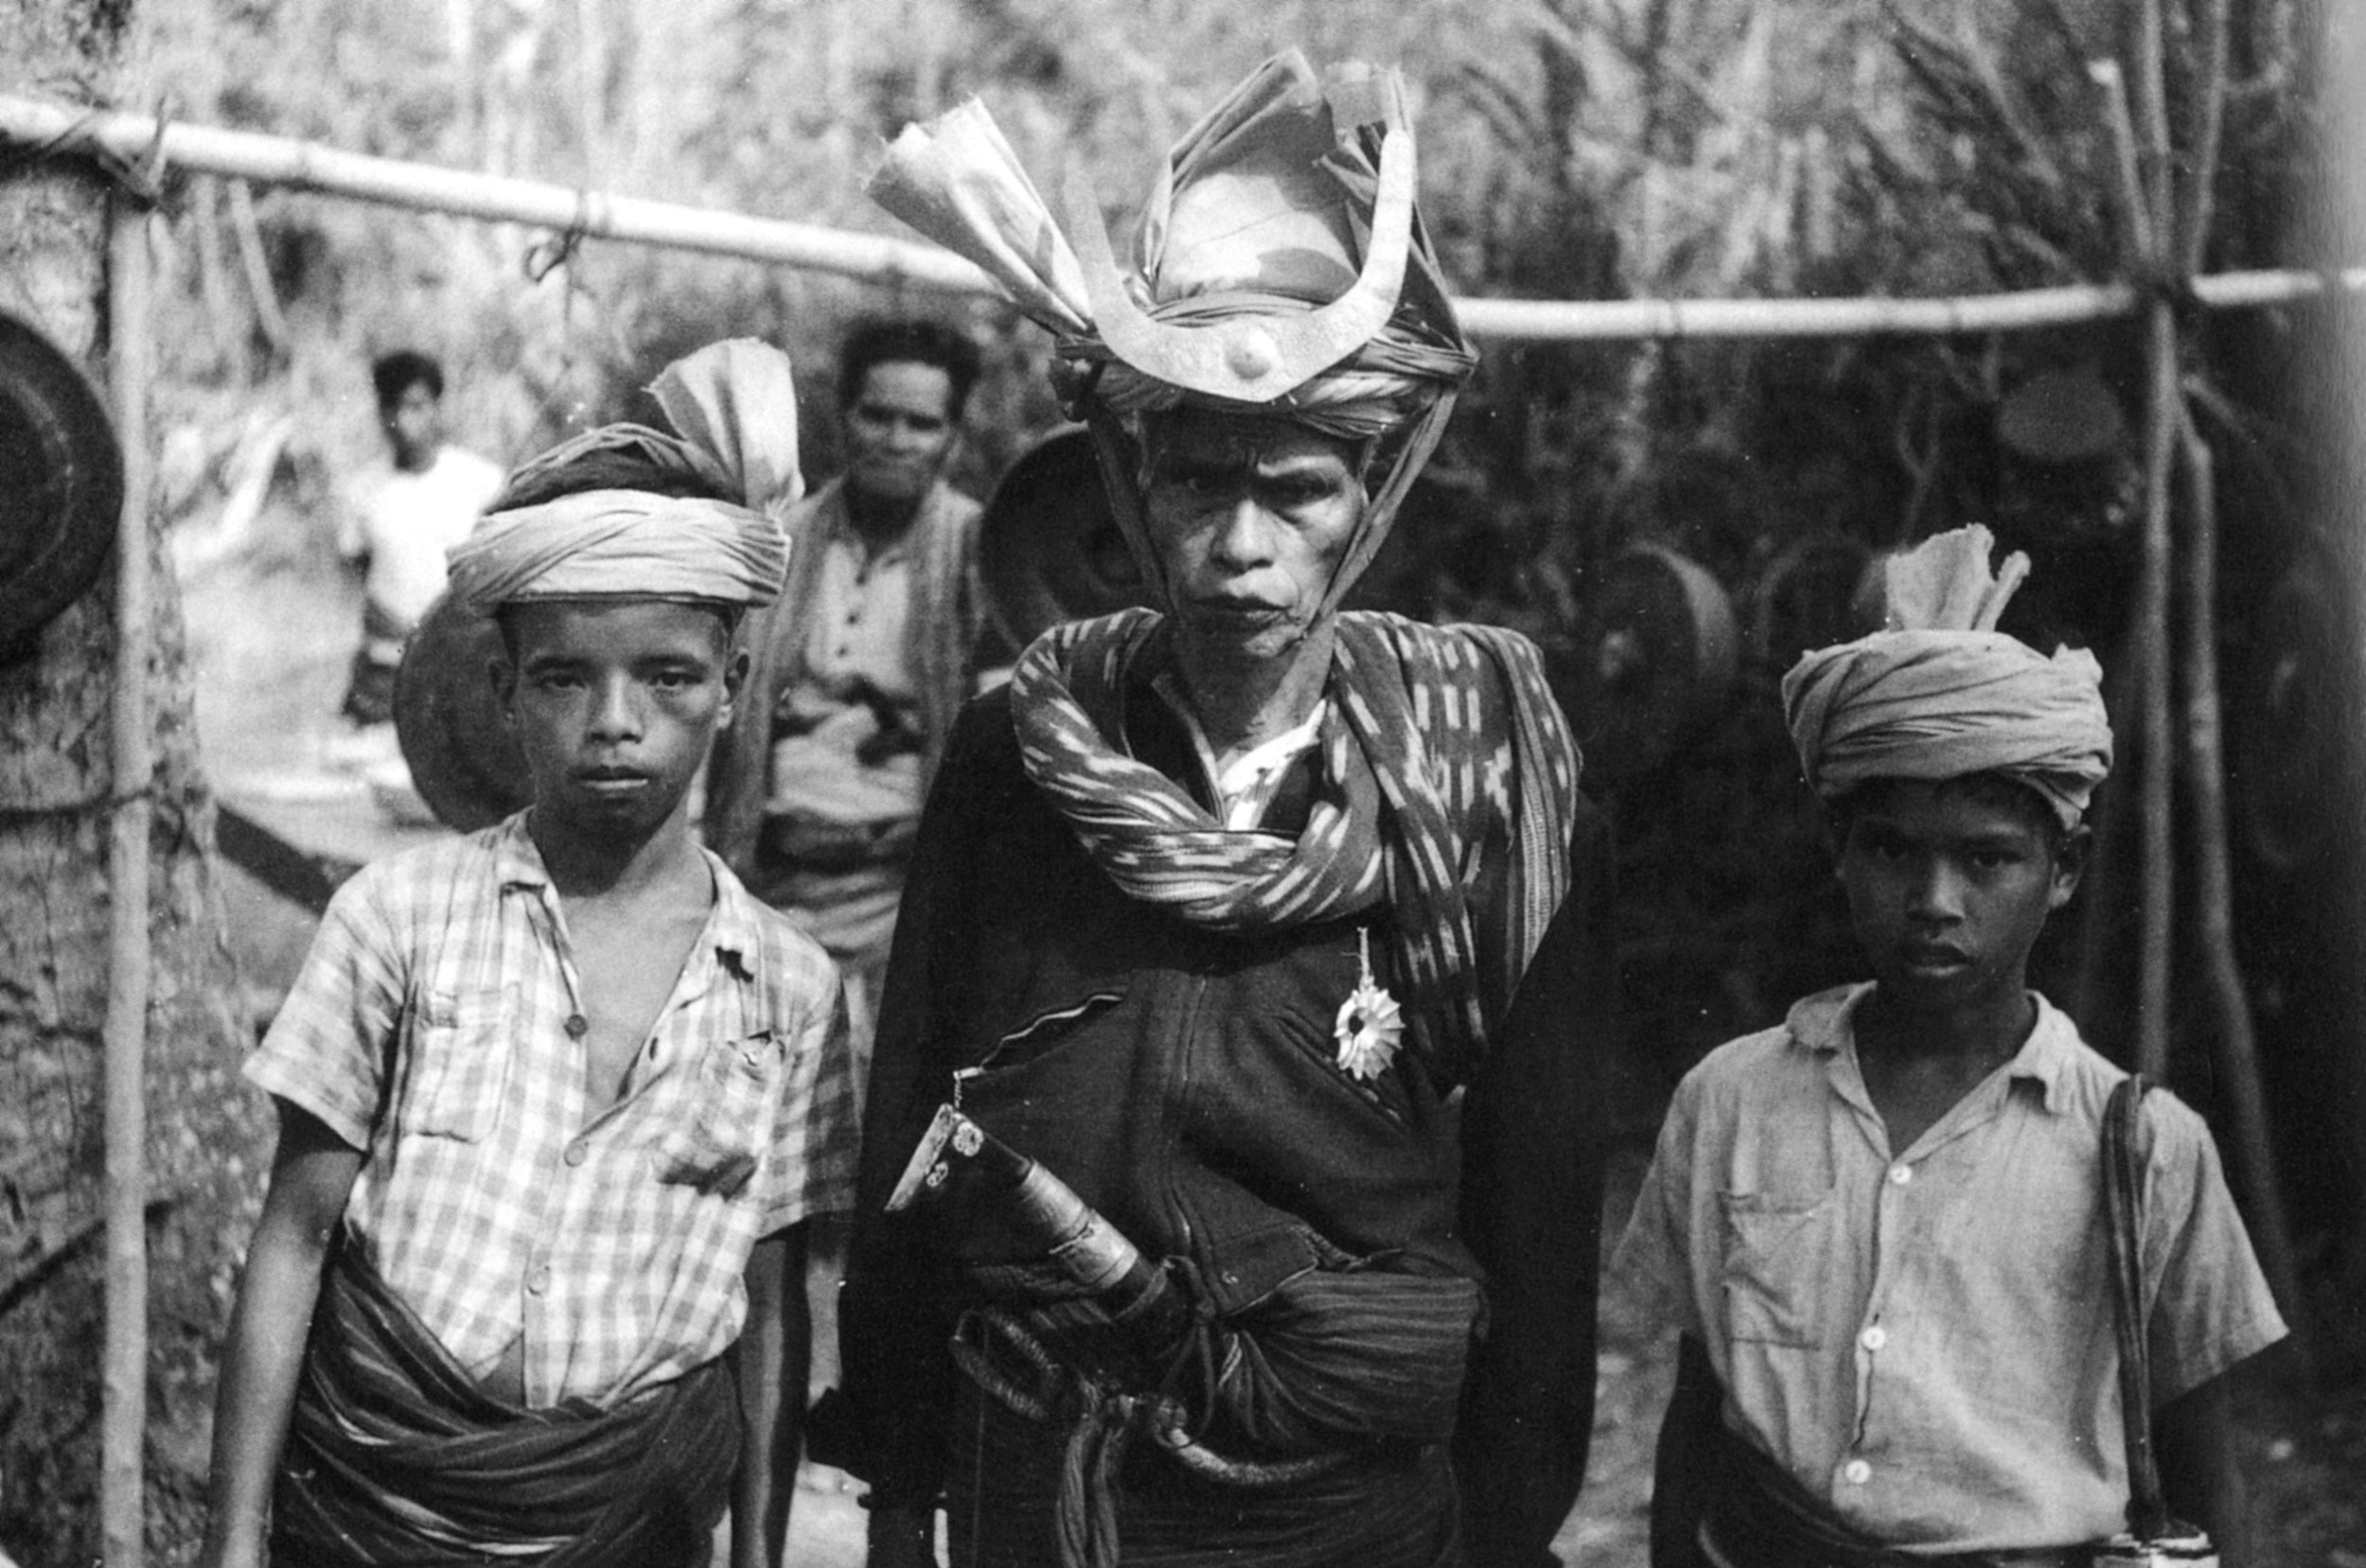 Amawau and sons, Bogor Kahale, Lamboya, West Sumba, c. 1960